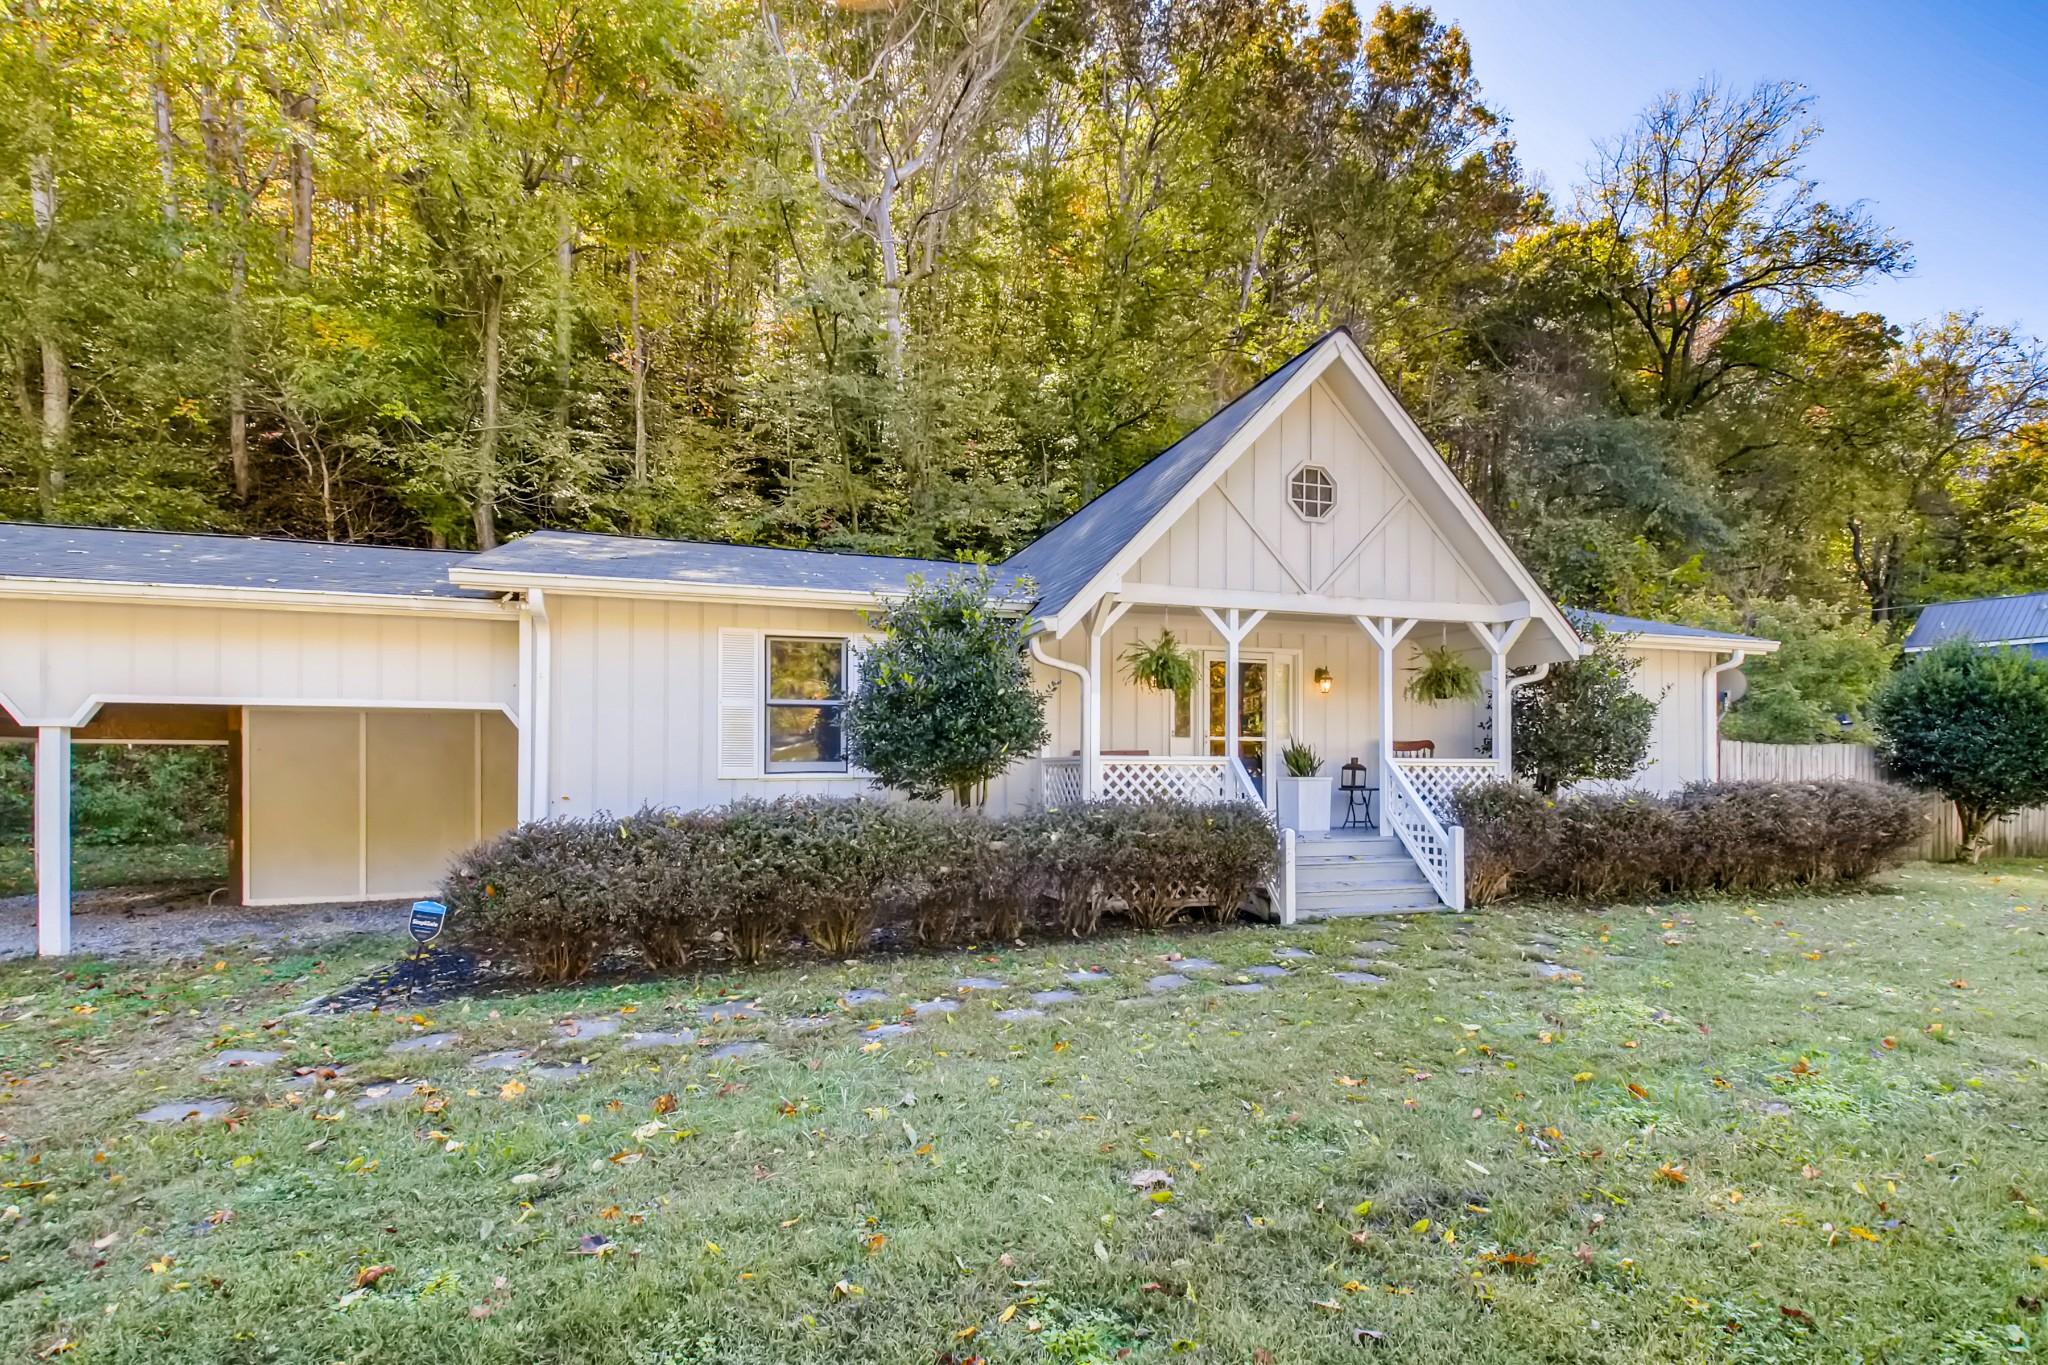 1041 Deerfoot Dr Property Photo - Pegram, TN real estate listing